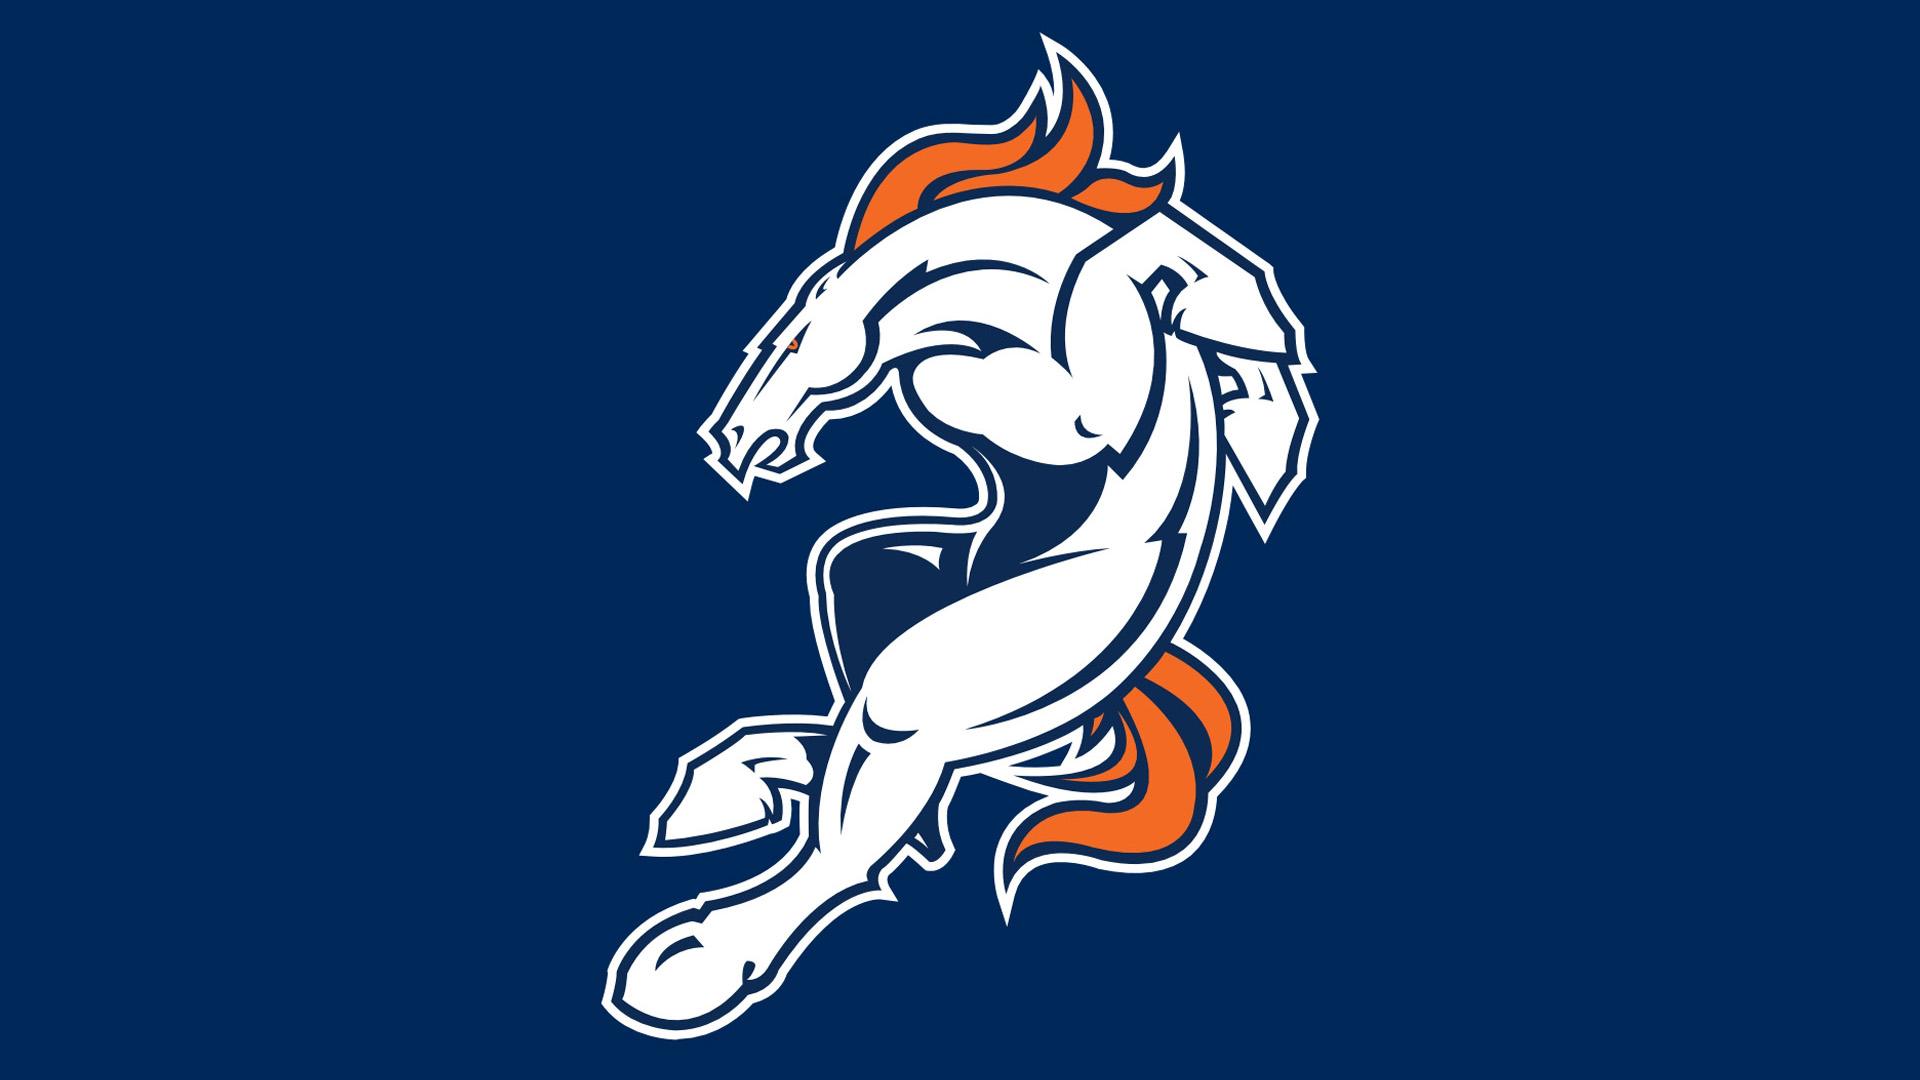 [45+] Denver Broncos Logos Wallpaper on WallpaperSafari